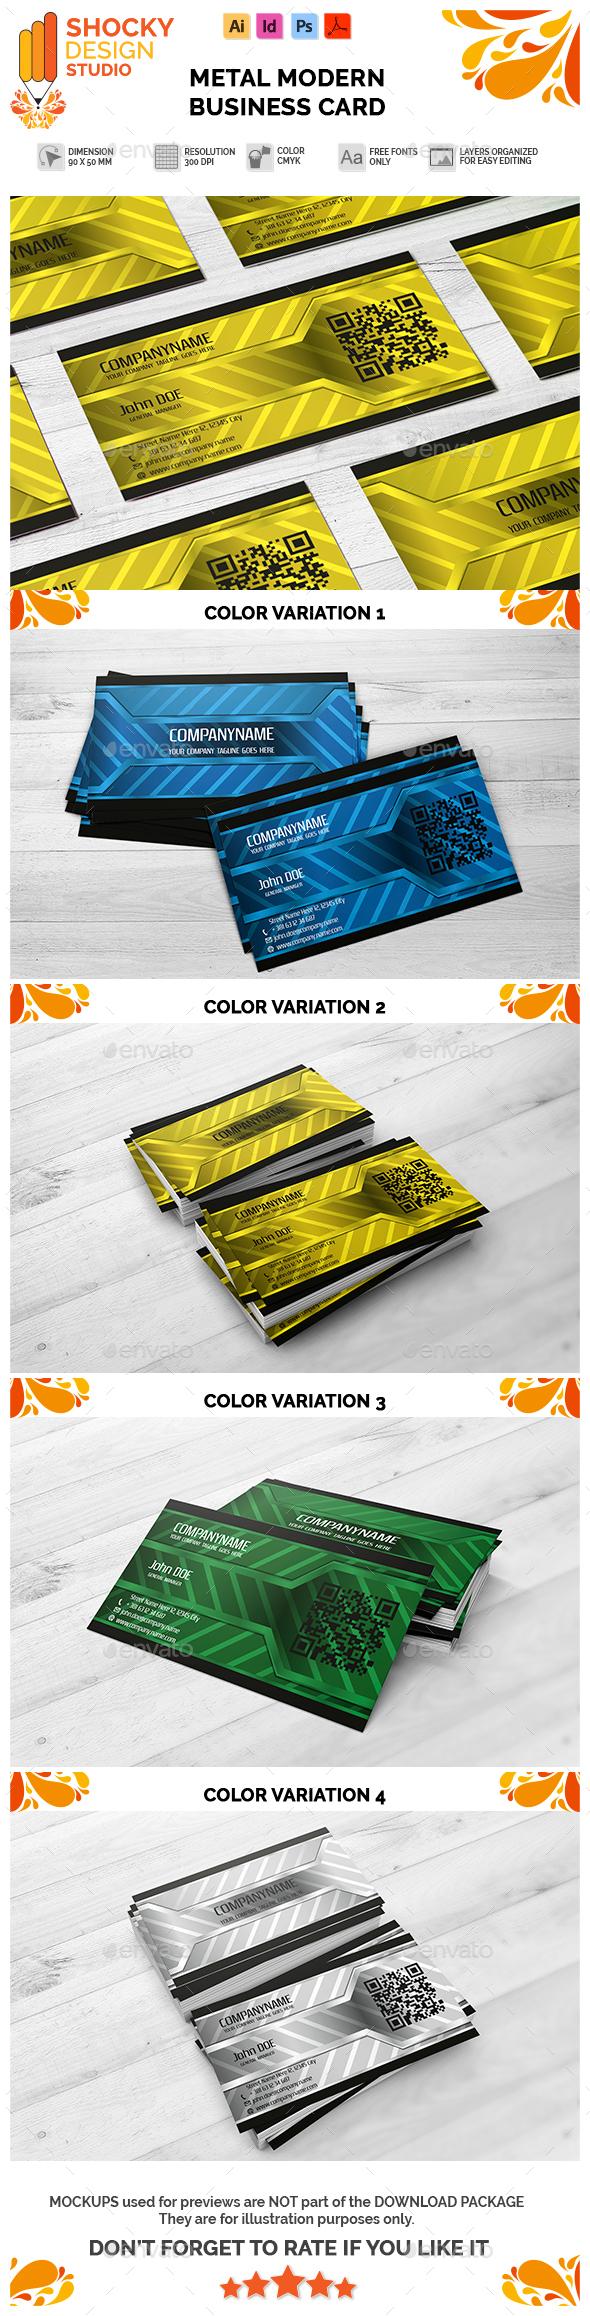 Modern Business Card Metal Template - Creative Business Cards